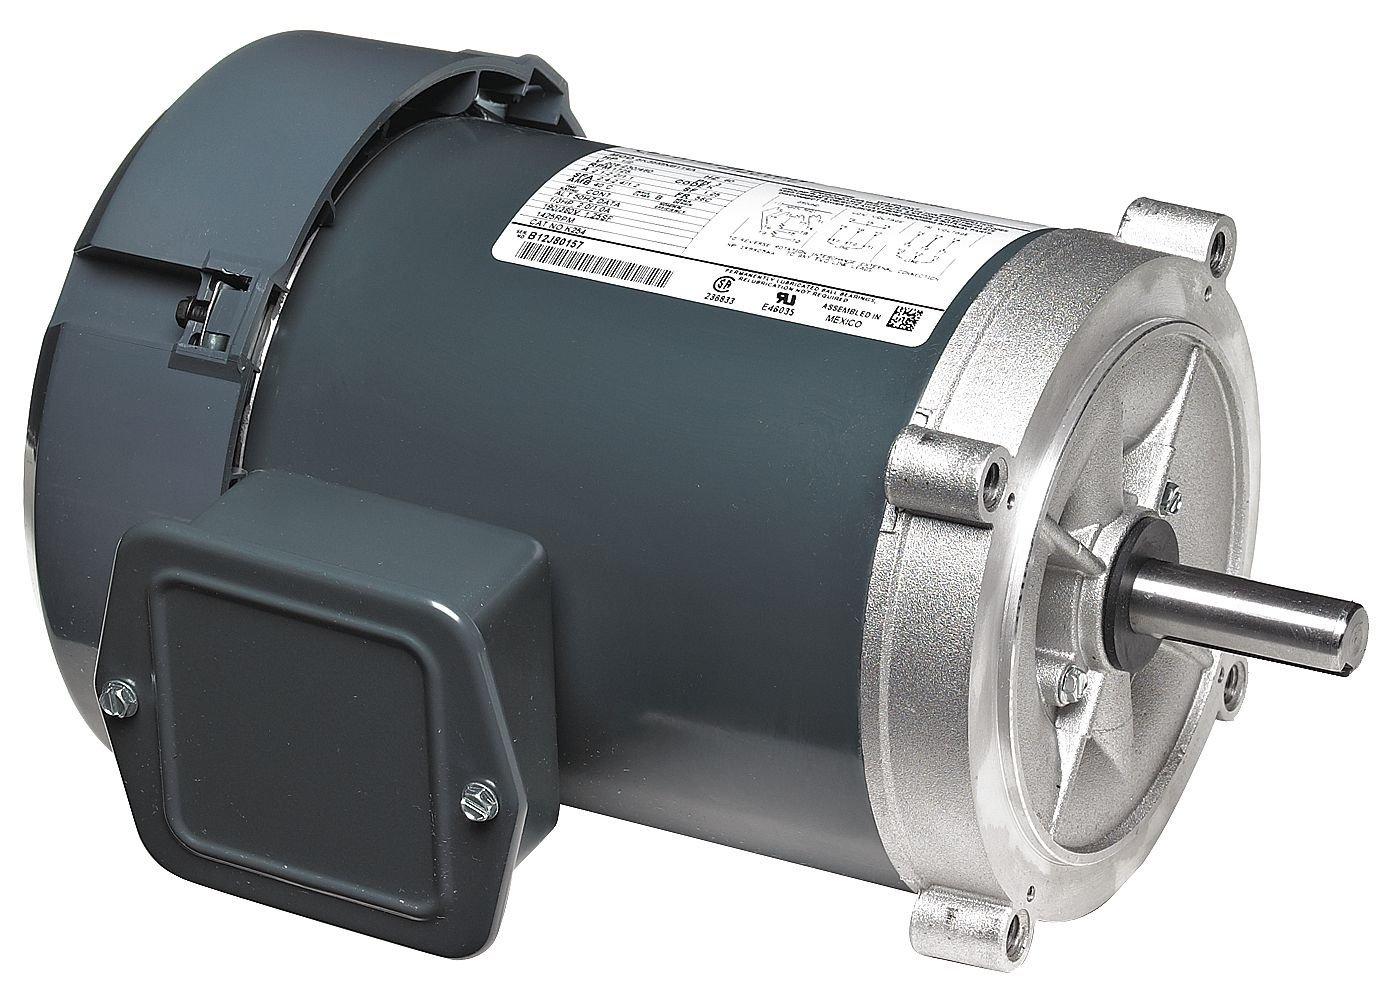 Marathon Electric / Regal Beloit - 56T34F5321 - 1/2, 1/3 HP Jet Pump Motor, 3-Phase, 3600 Nameplate RPM, 208-230/460 Voltage, 56C Frame